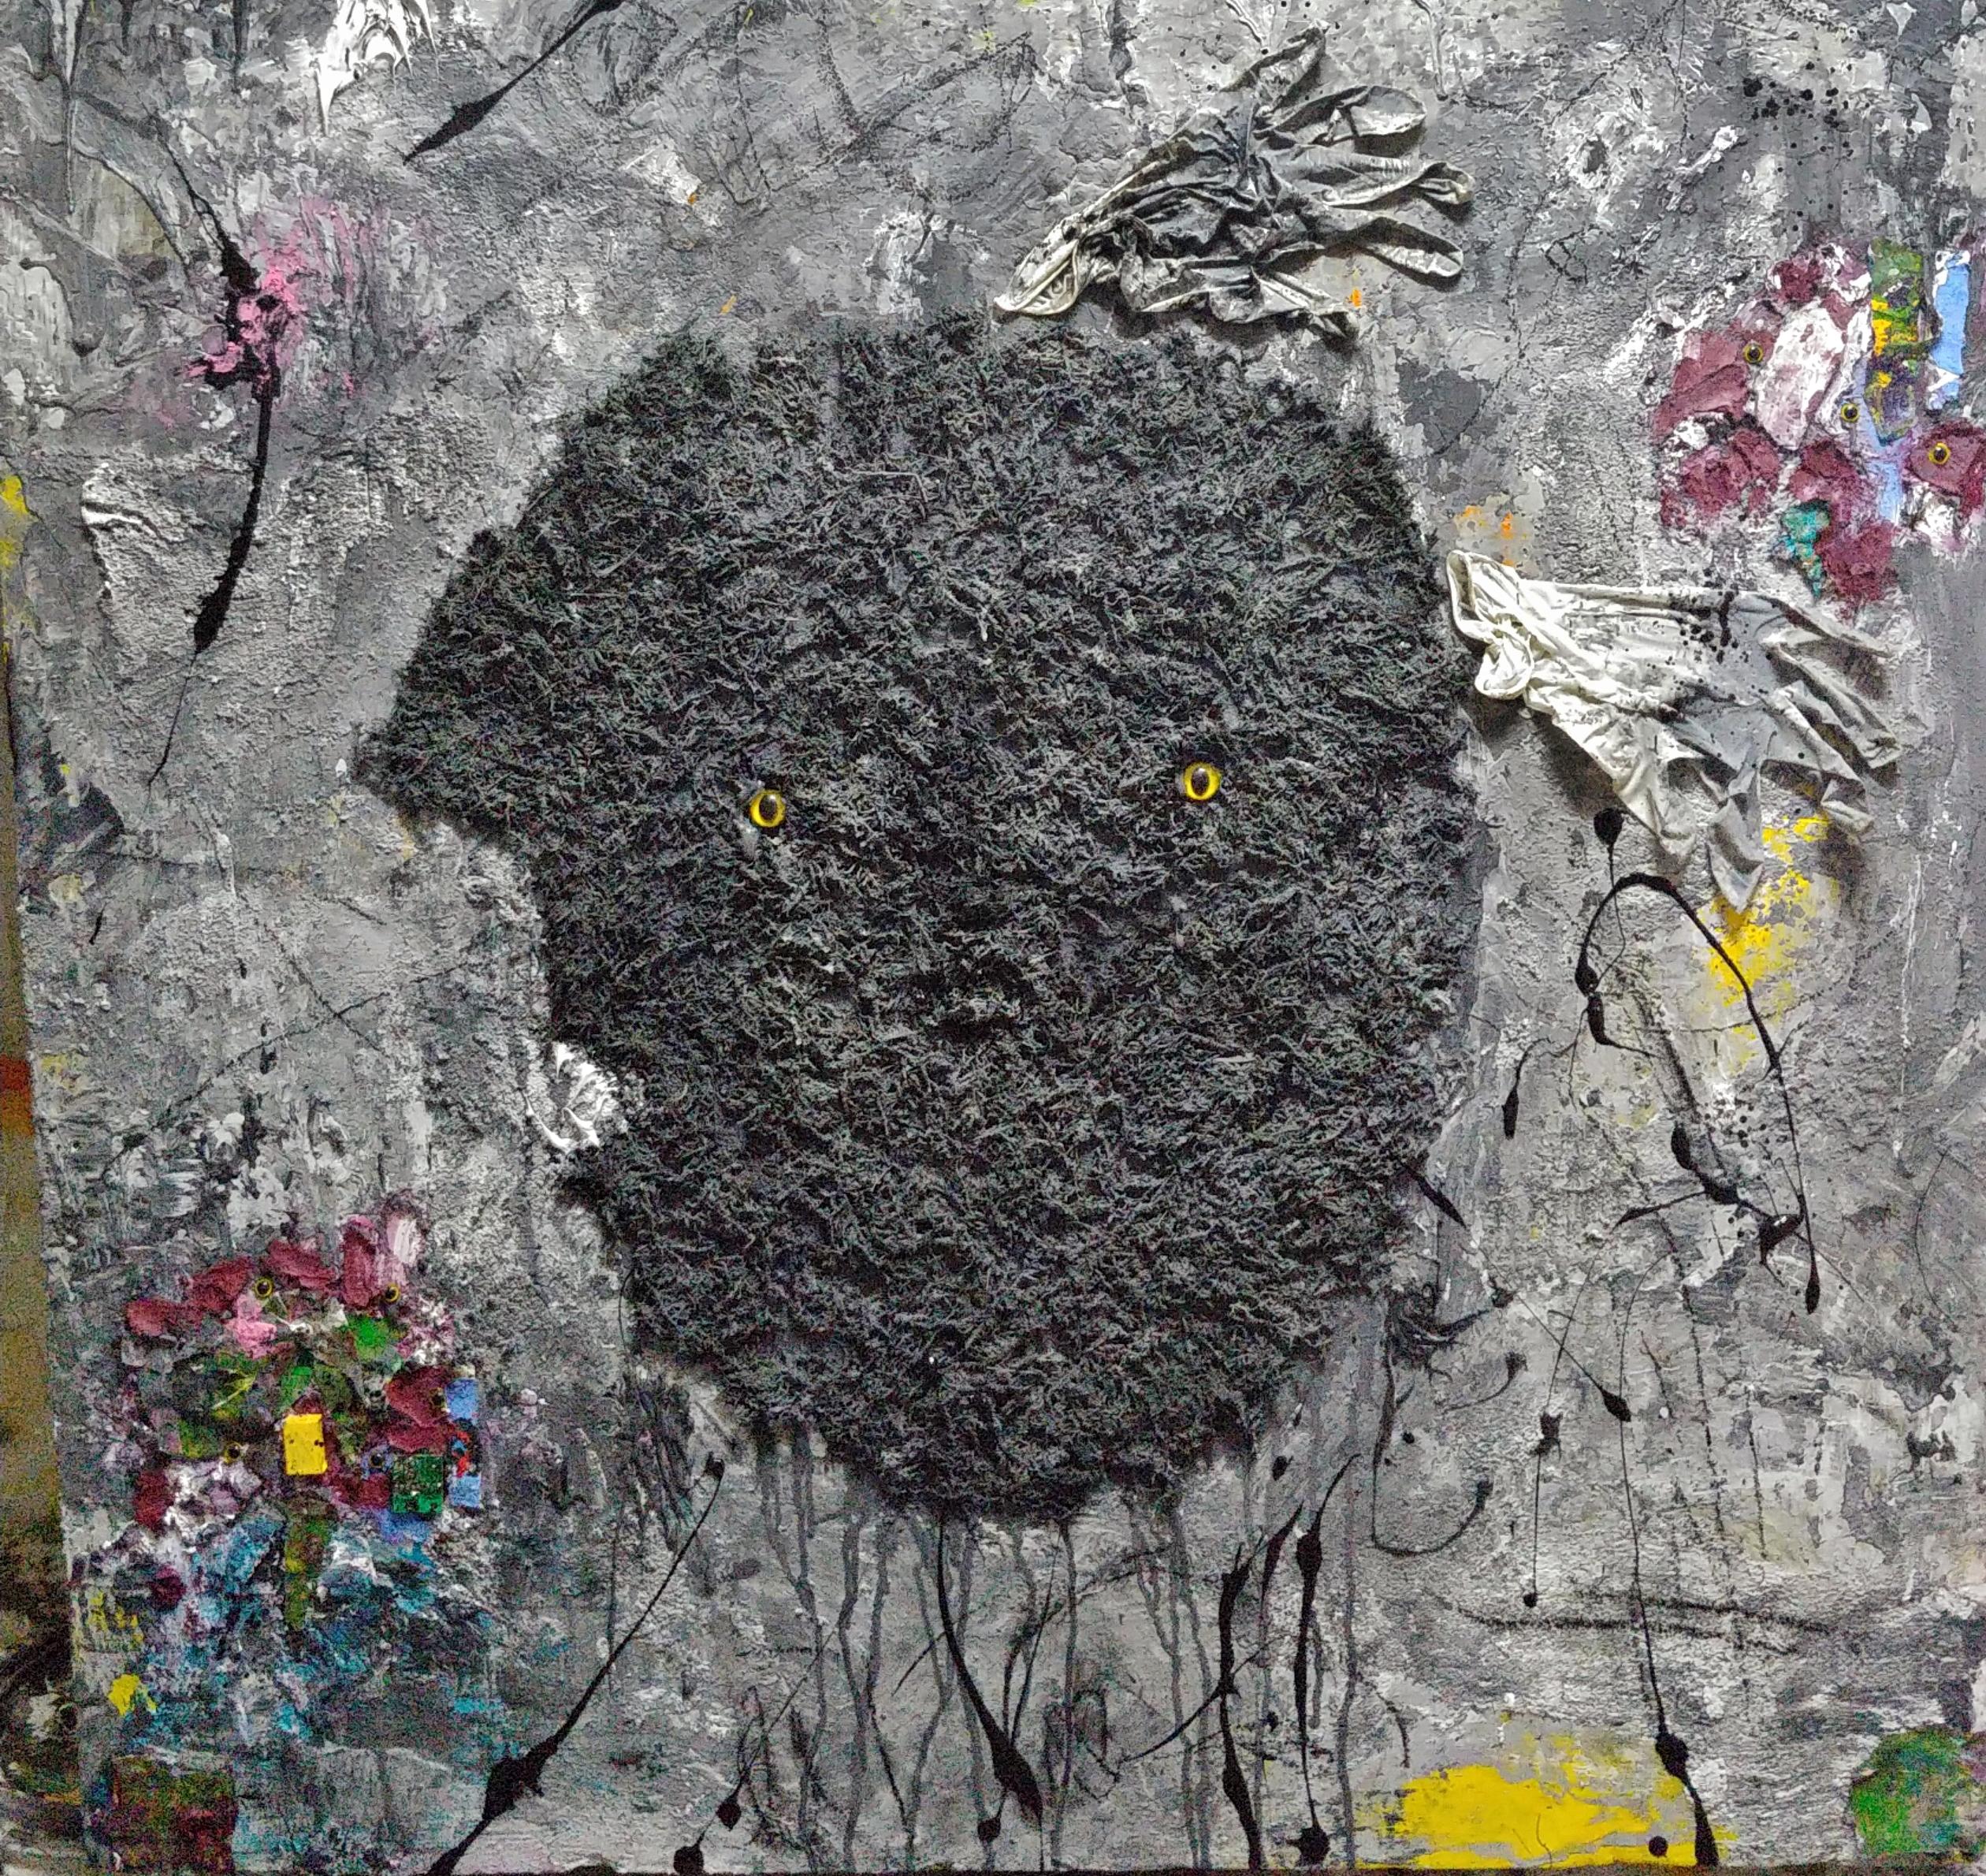 Ugly Duckling 30, 90x90cm, 종이, 플라스틱, 라텍스 장갑, 아크릴, 시멘트, 모레, 이끼 on 아이소핑크, 2017